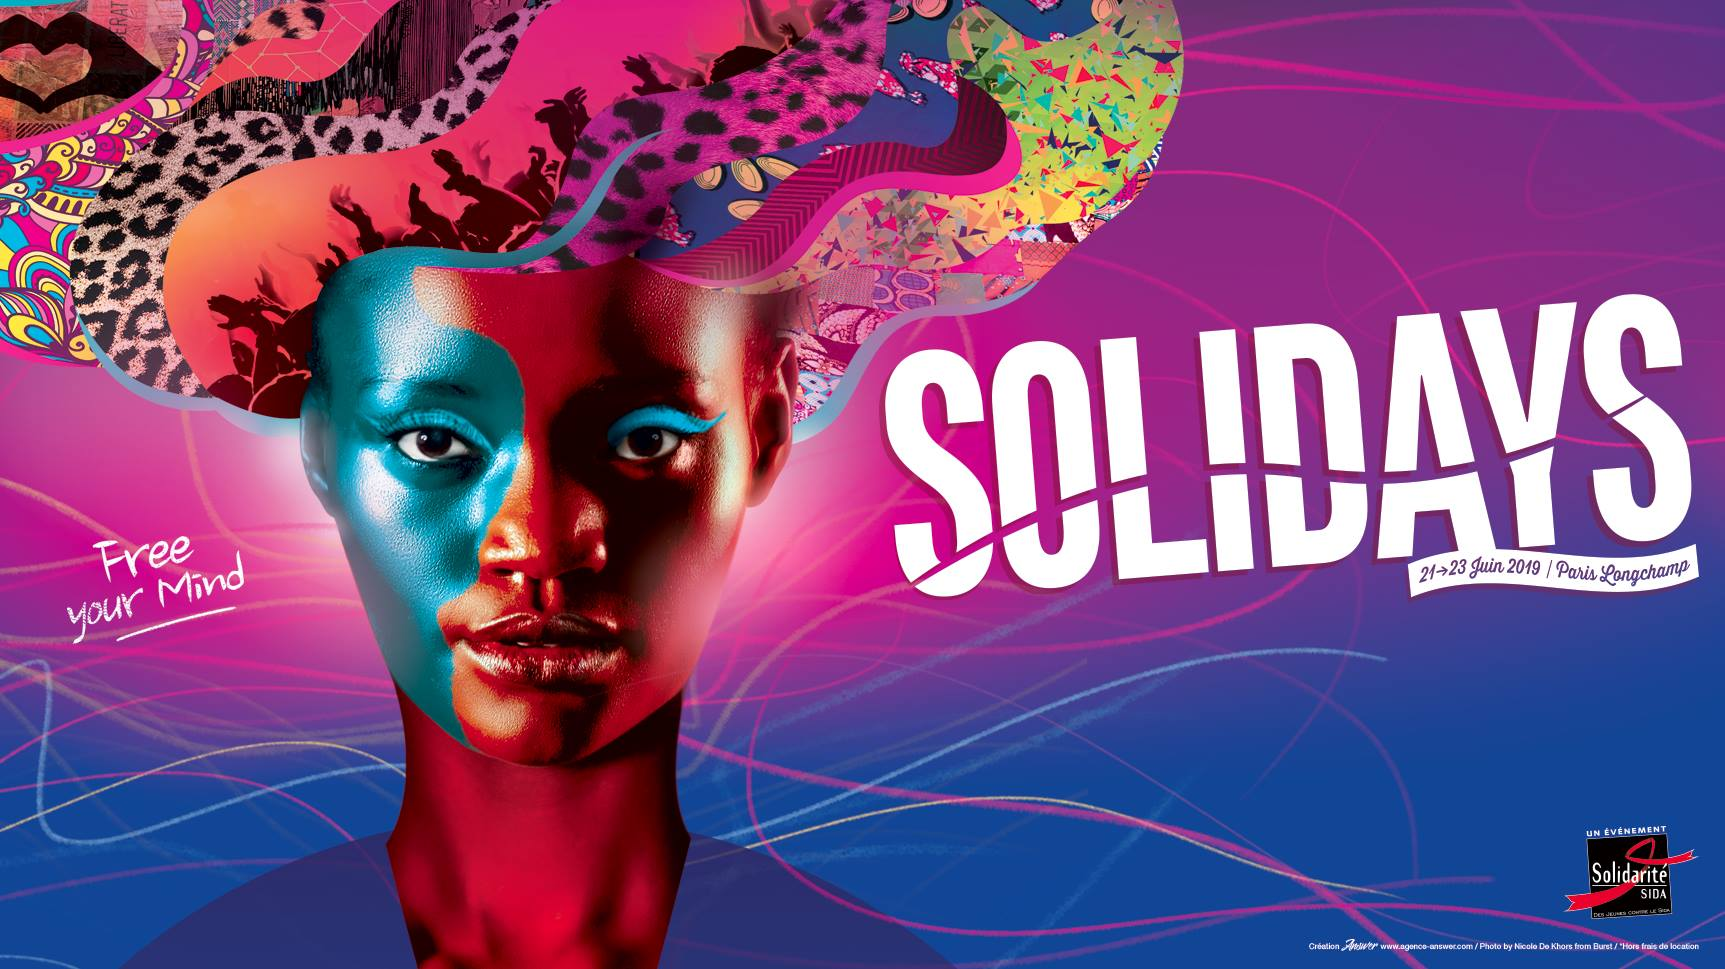 Solidays-2019